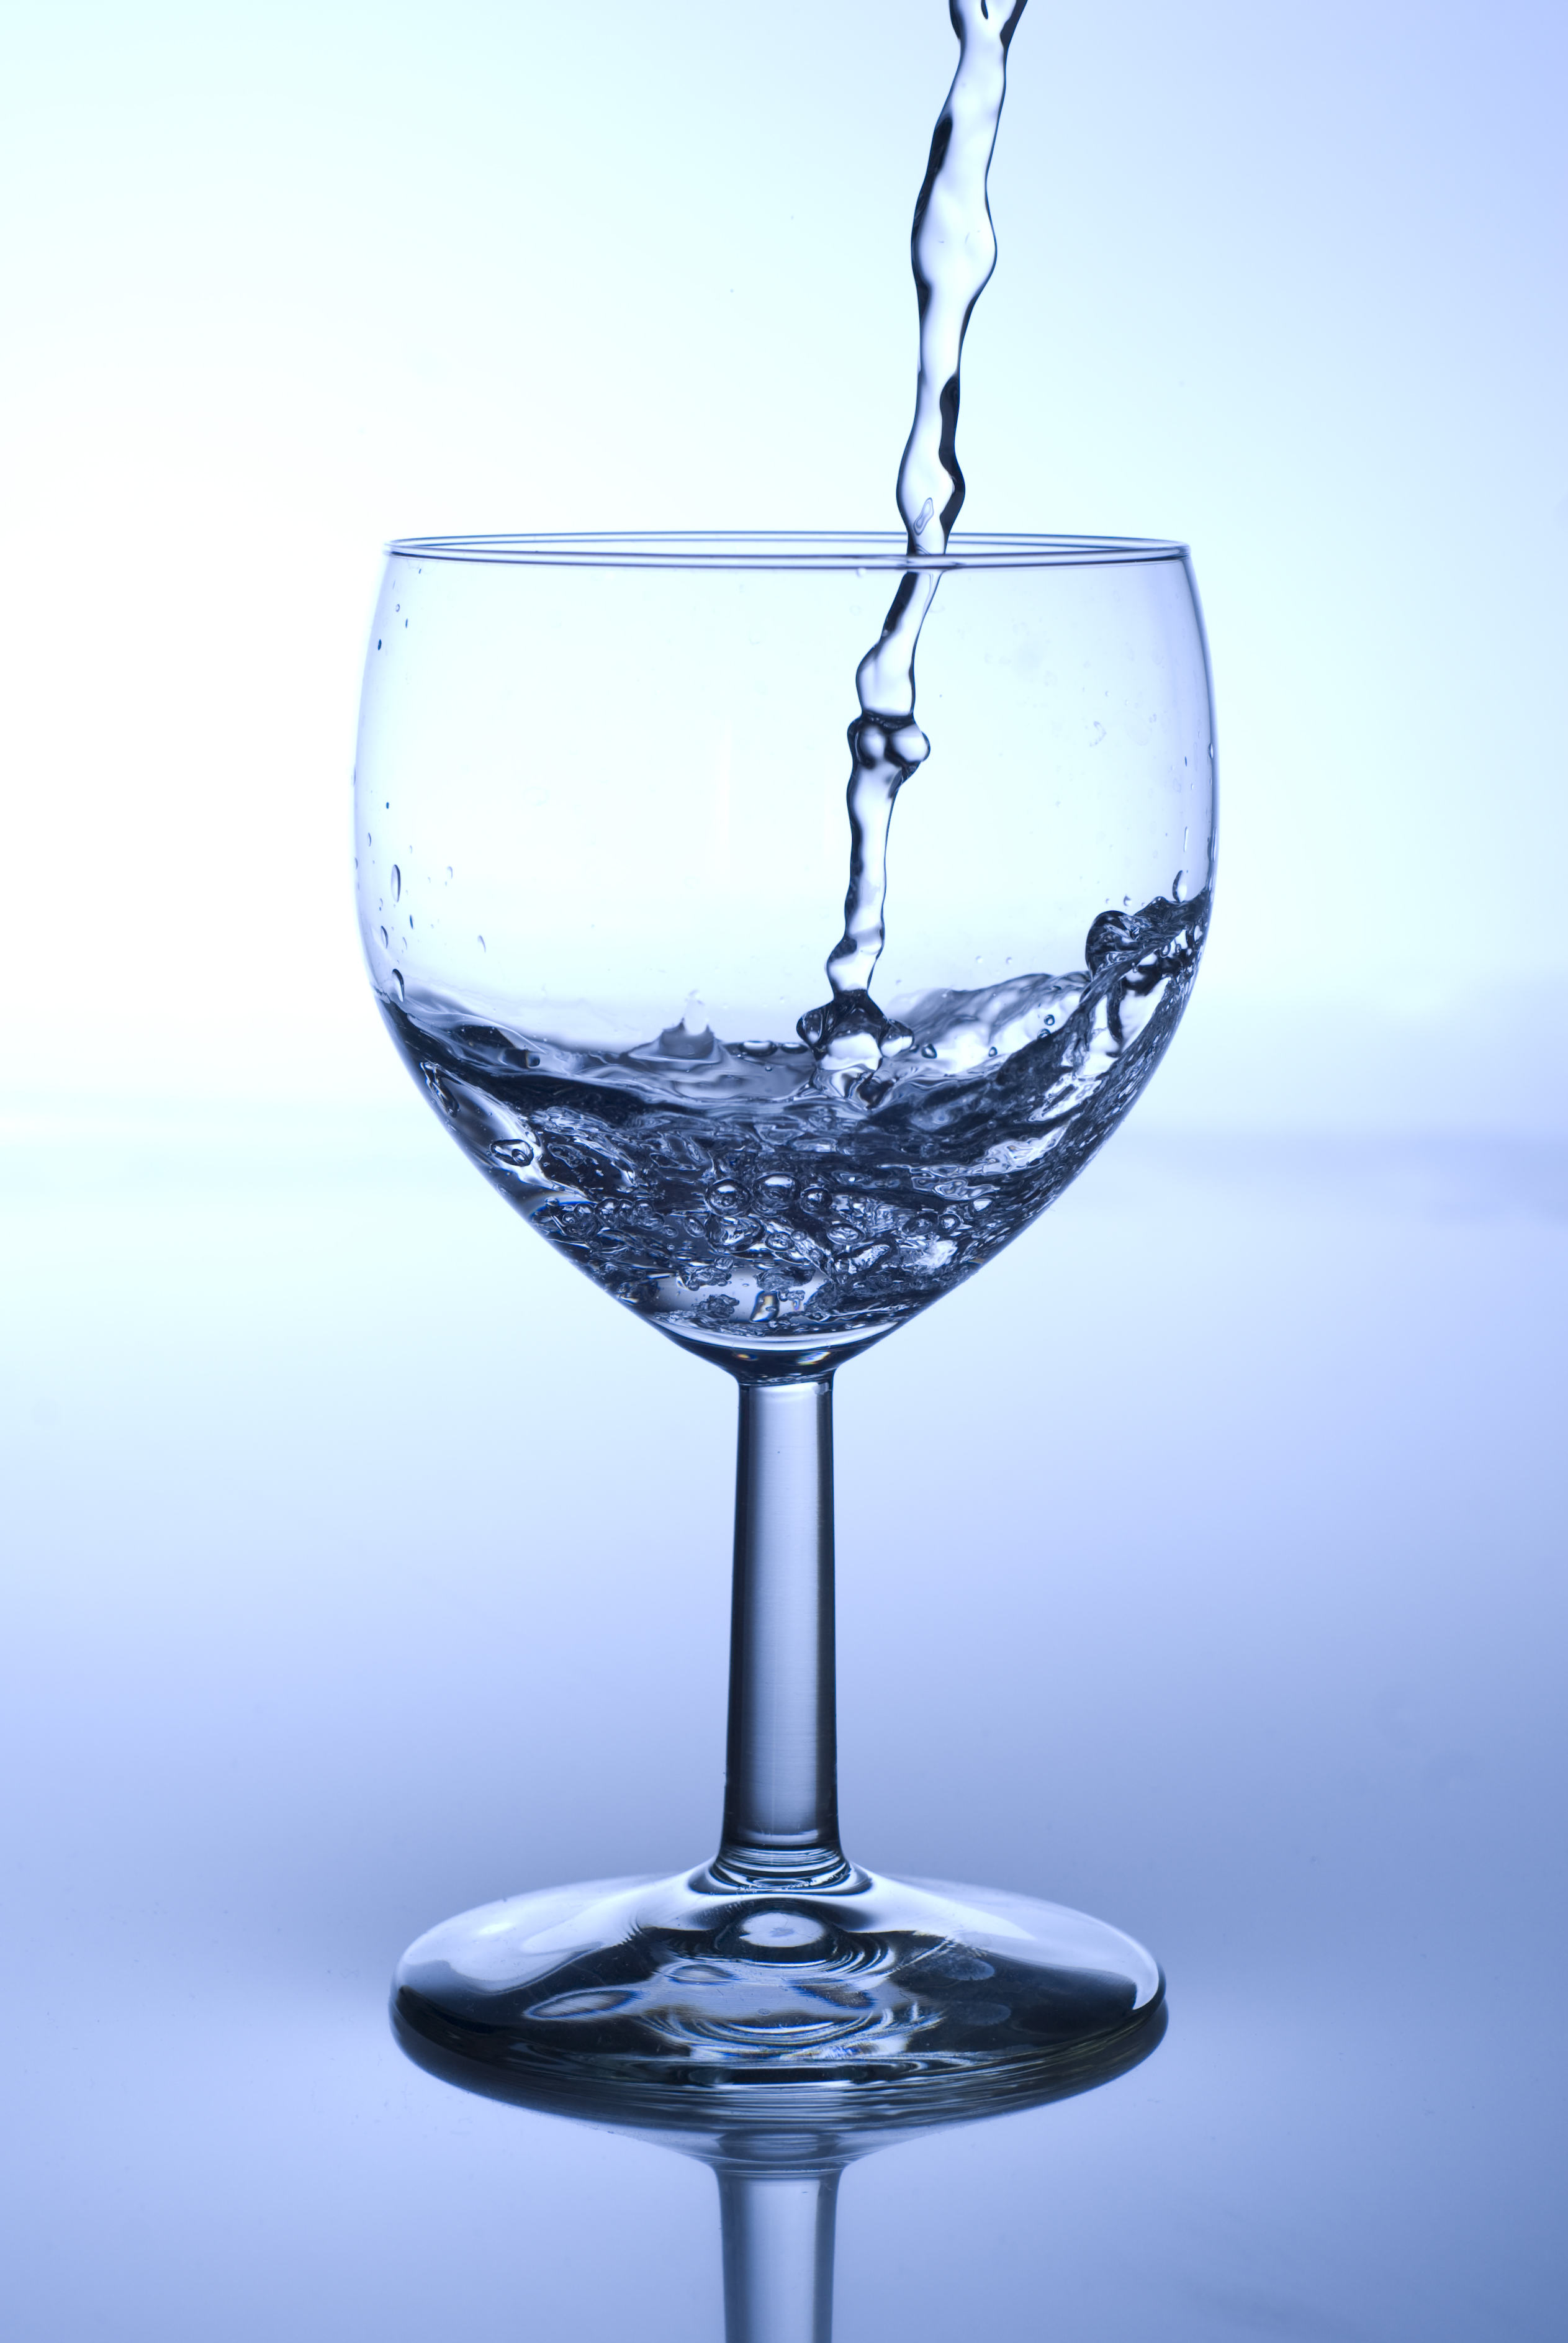 water glasses home termite treatmen